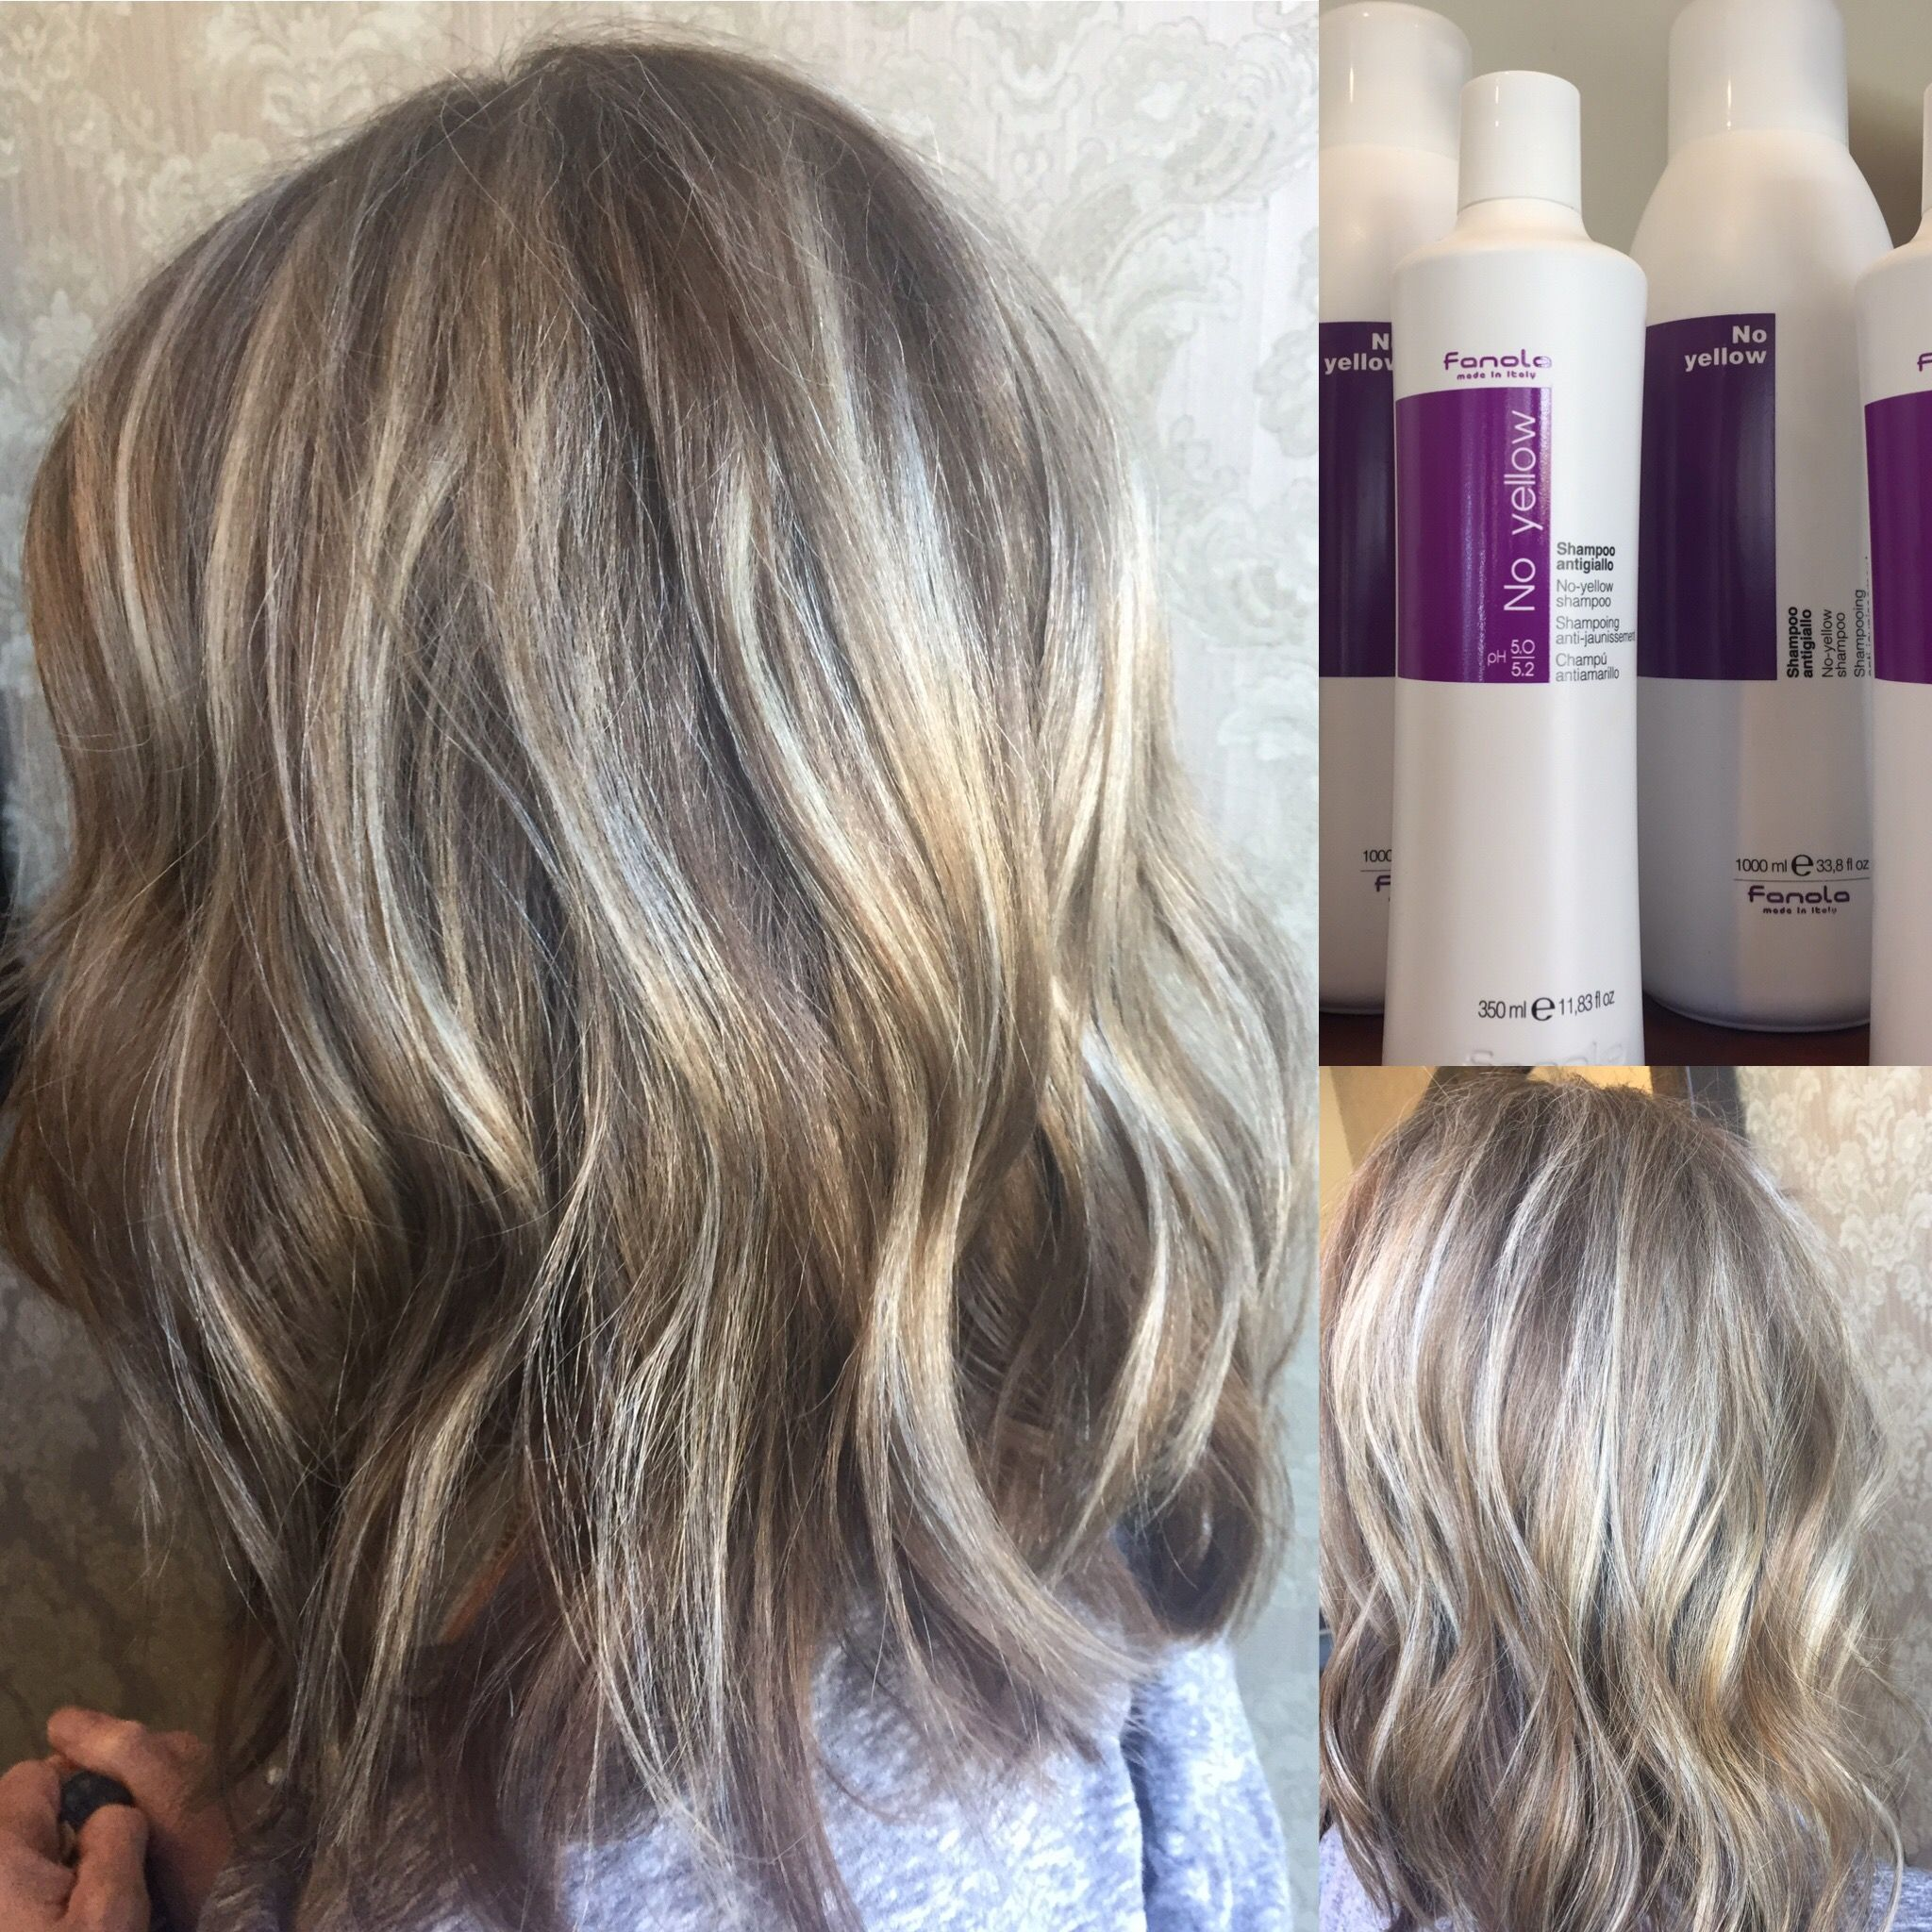 Icy Blonde Long Bob Lob Platinum Blonde Light Blonde Fanola No Yellow Shampoo Purple Shampoo